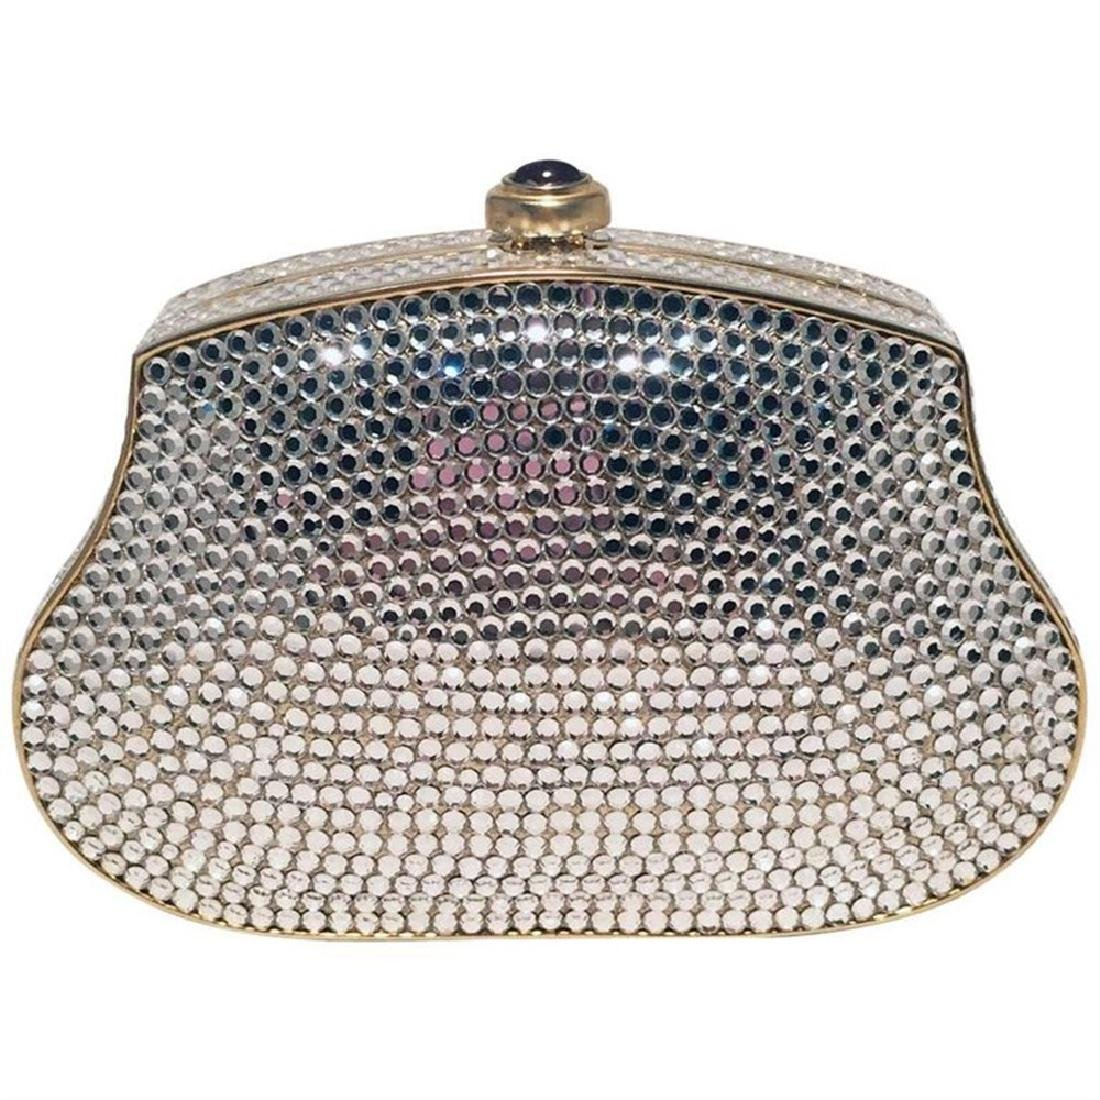 Judith Leiber Clear Swarovski Crystal Mini Minaudiere